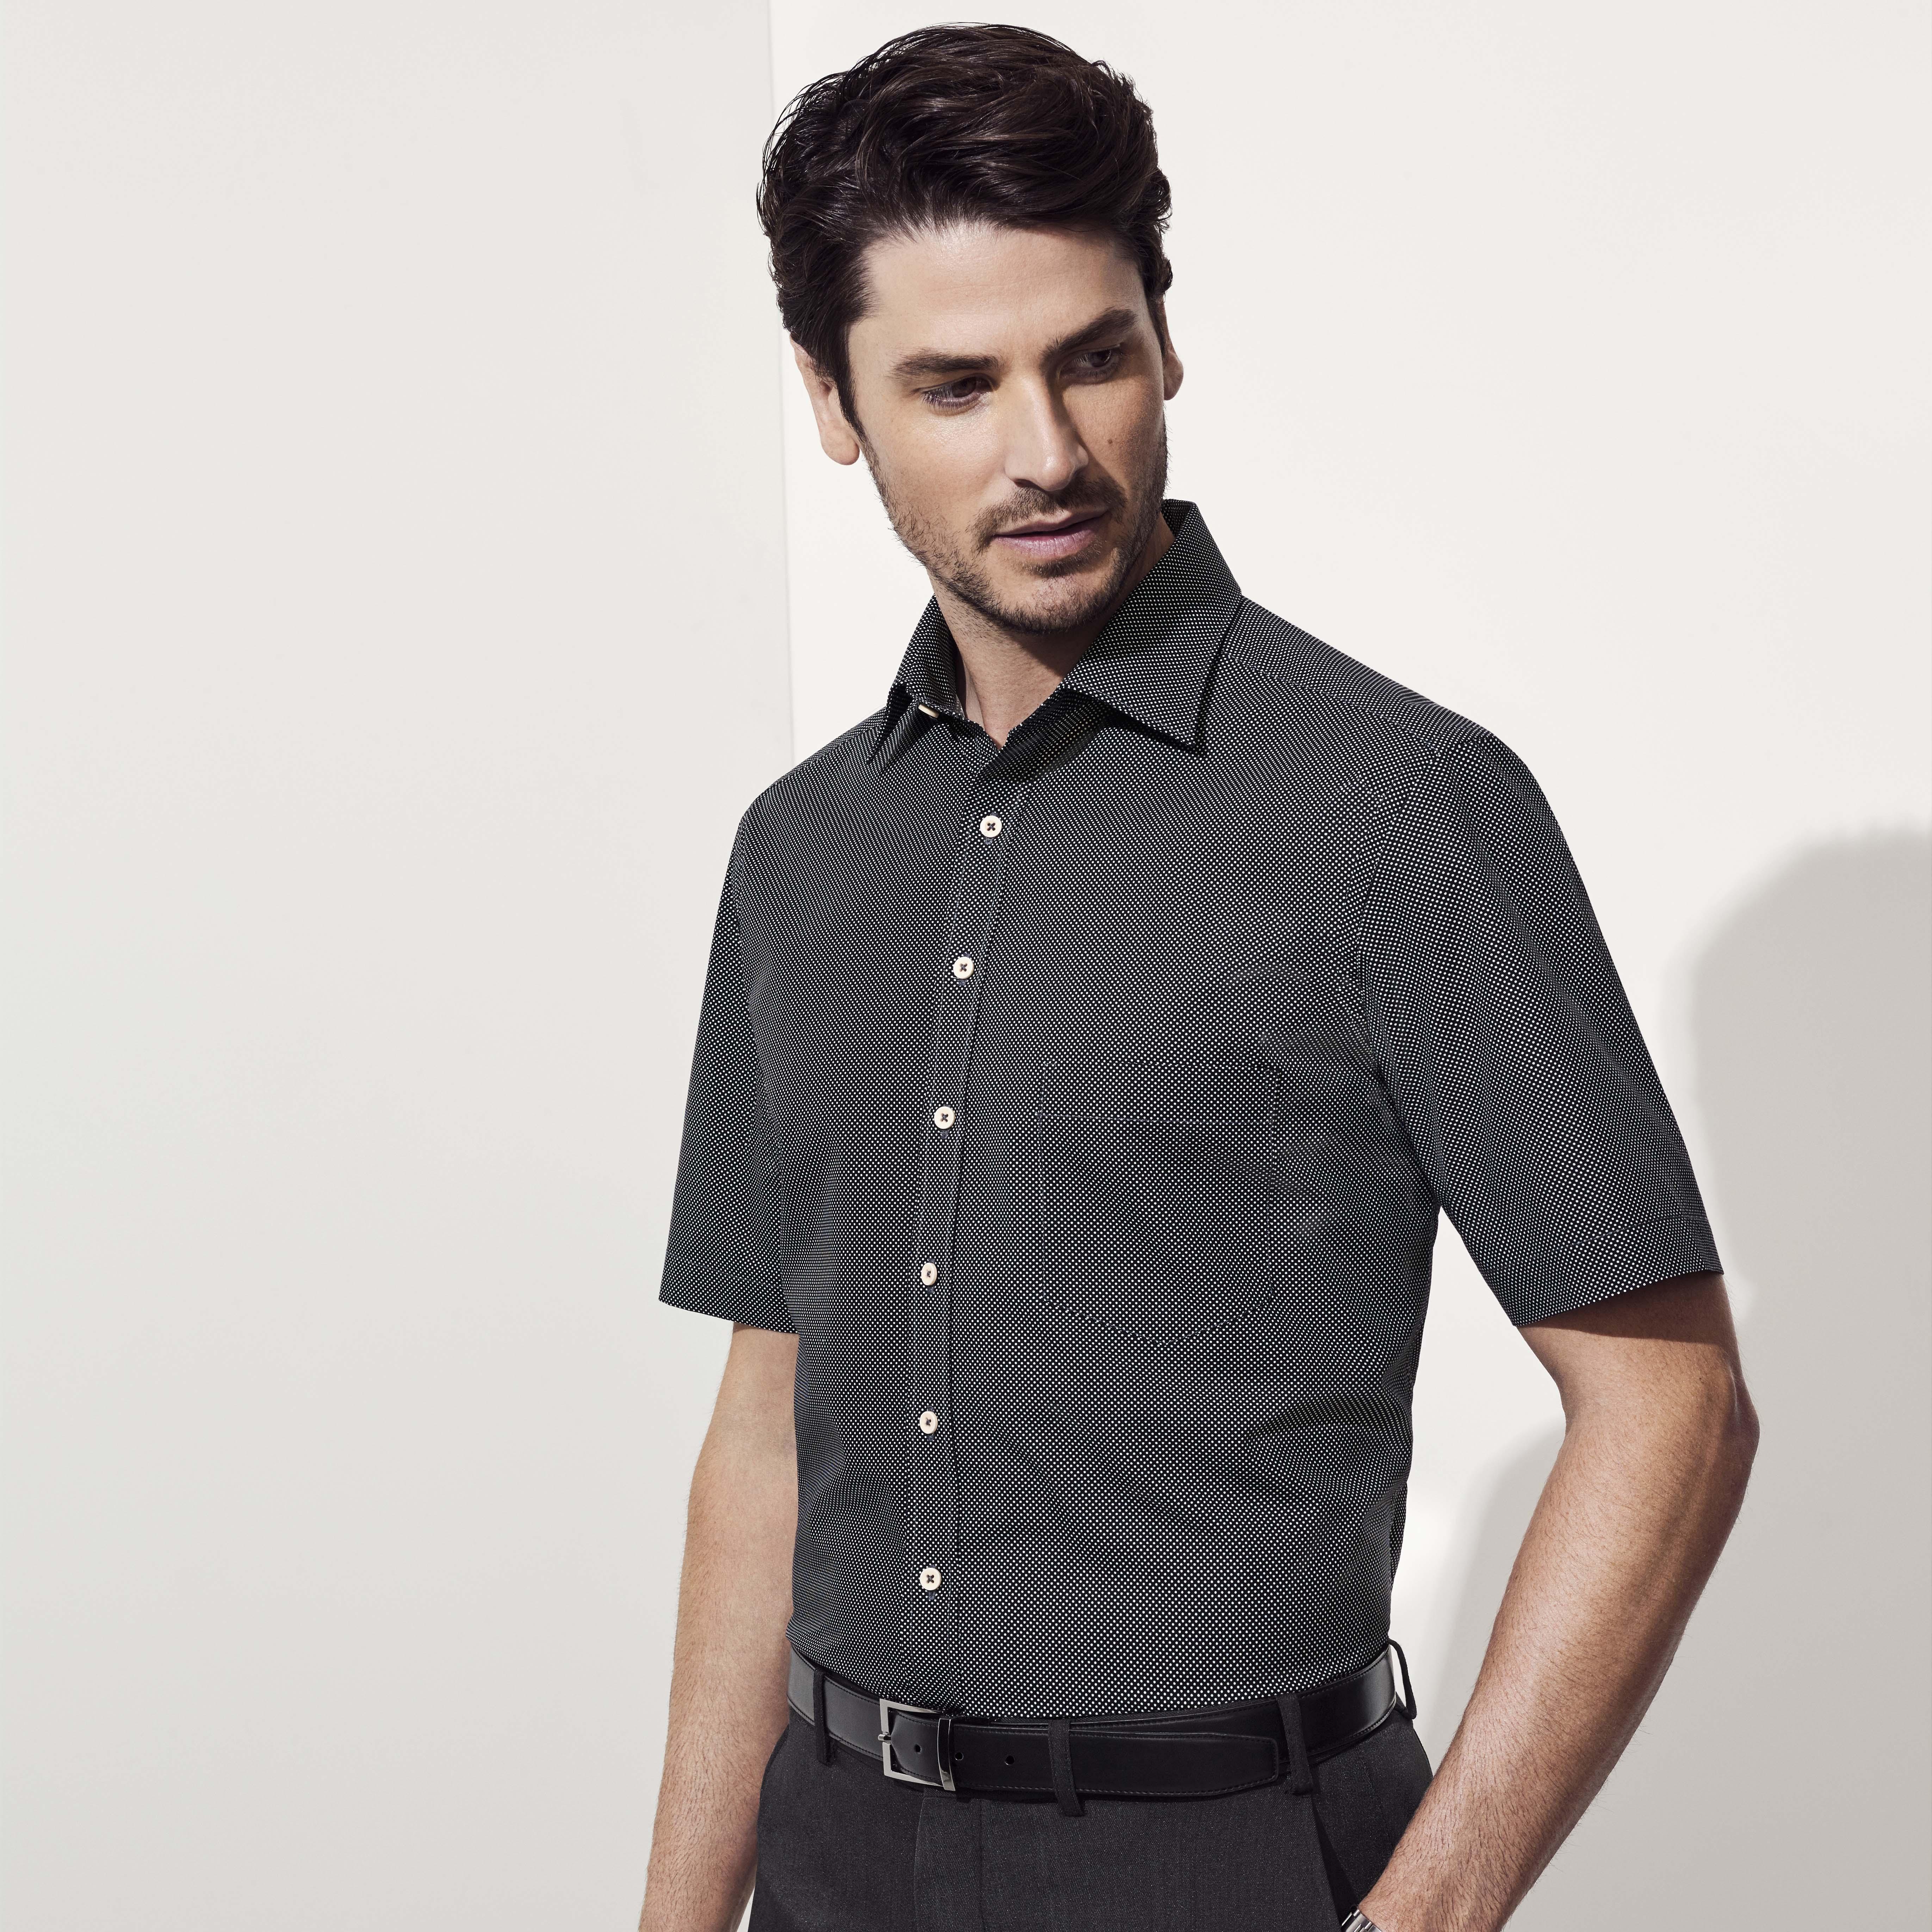 Mens Oscar Short Sleeve Shirt 44522 Hospitality